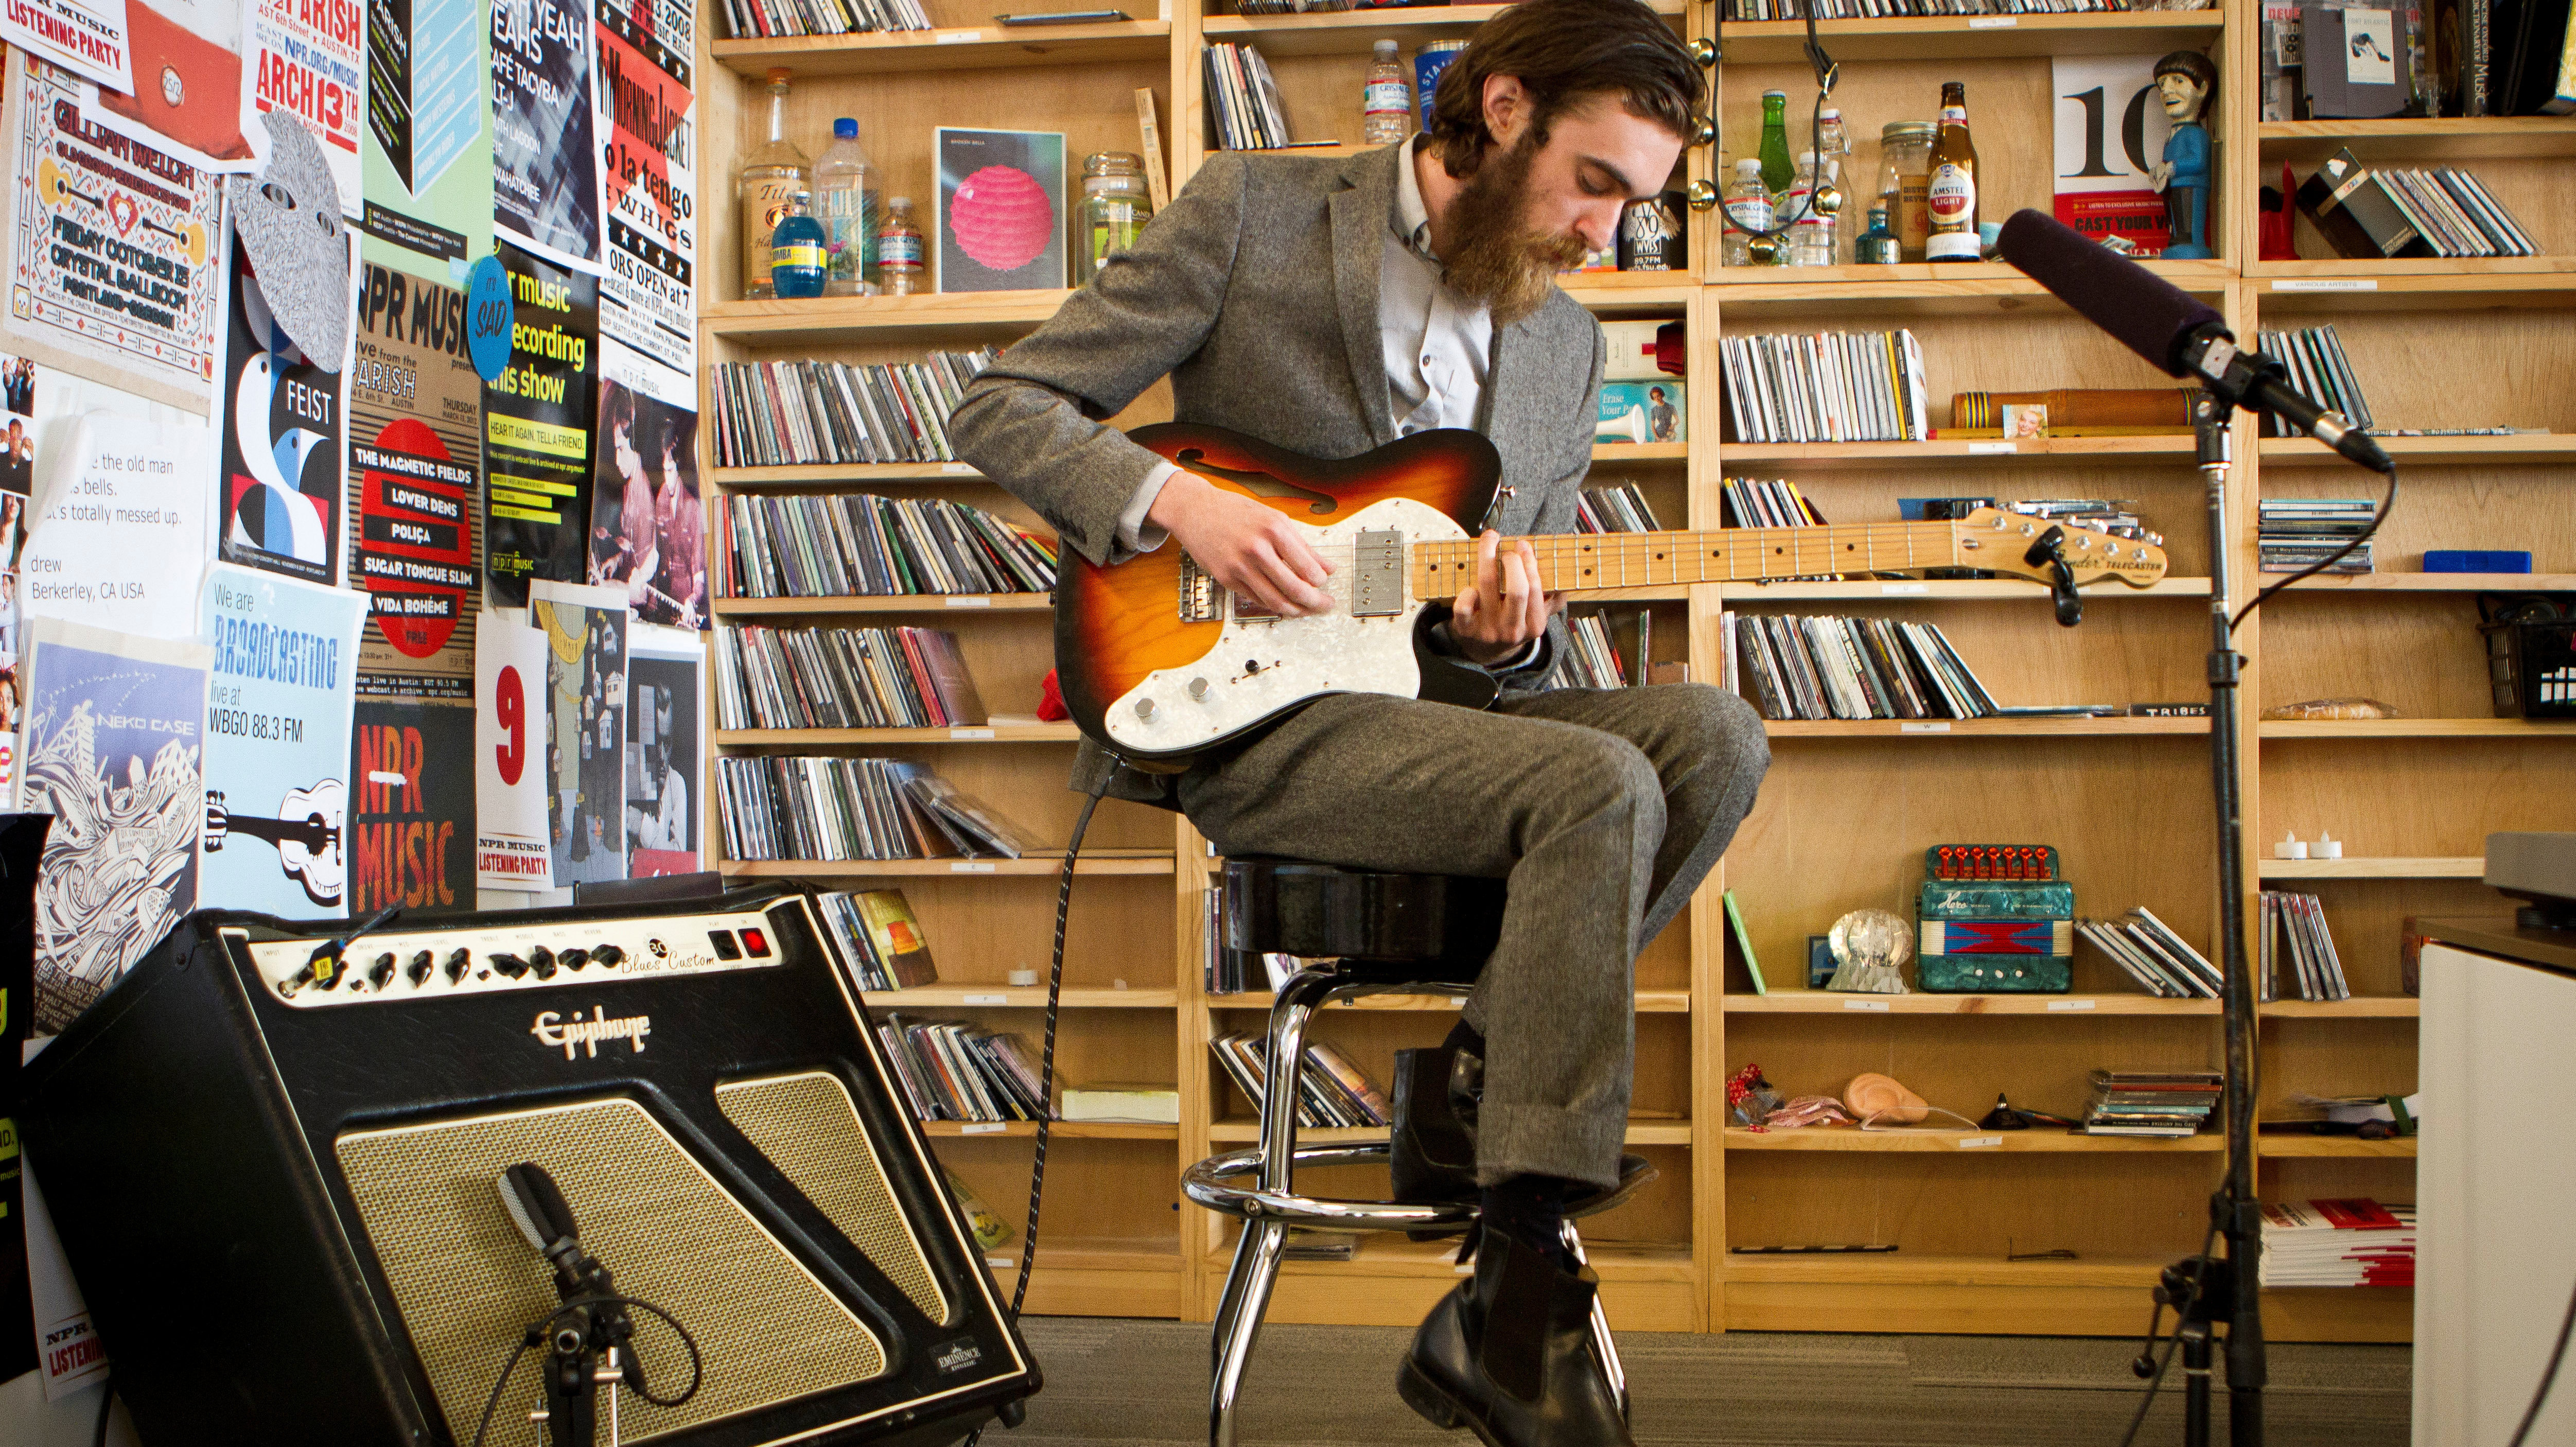 Andrea Echeverri: Keaton Henson: Tiny Desk Concert : NPR